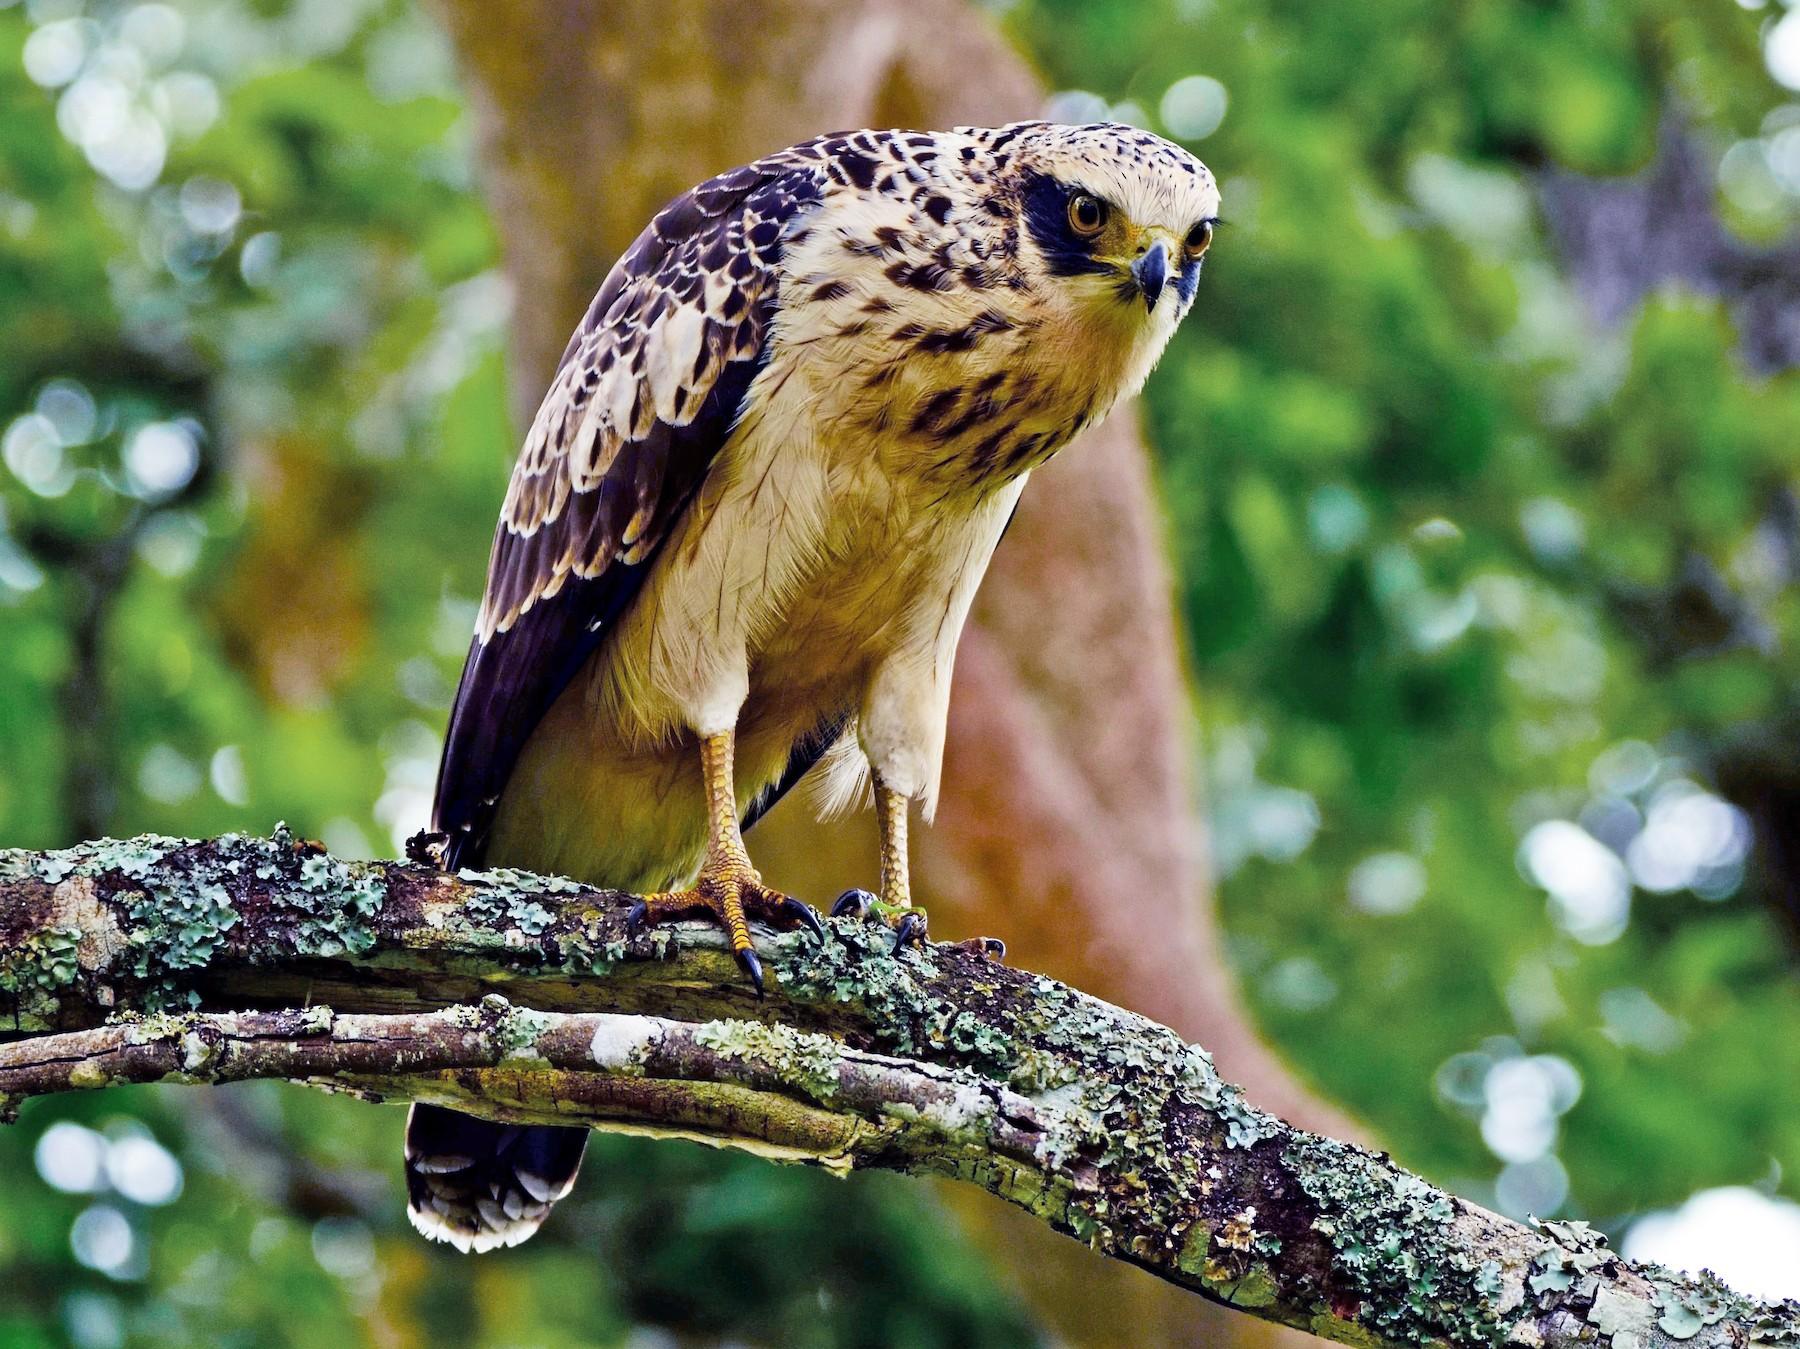 Crested Serpent-Eagle - Prashobh Ailyam Nair